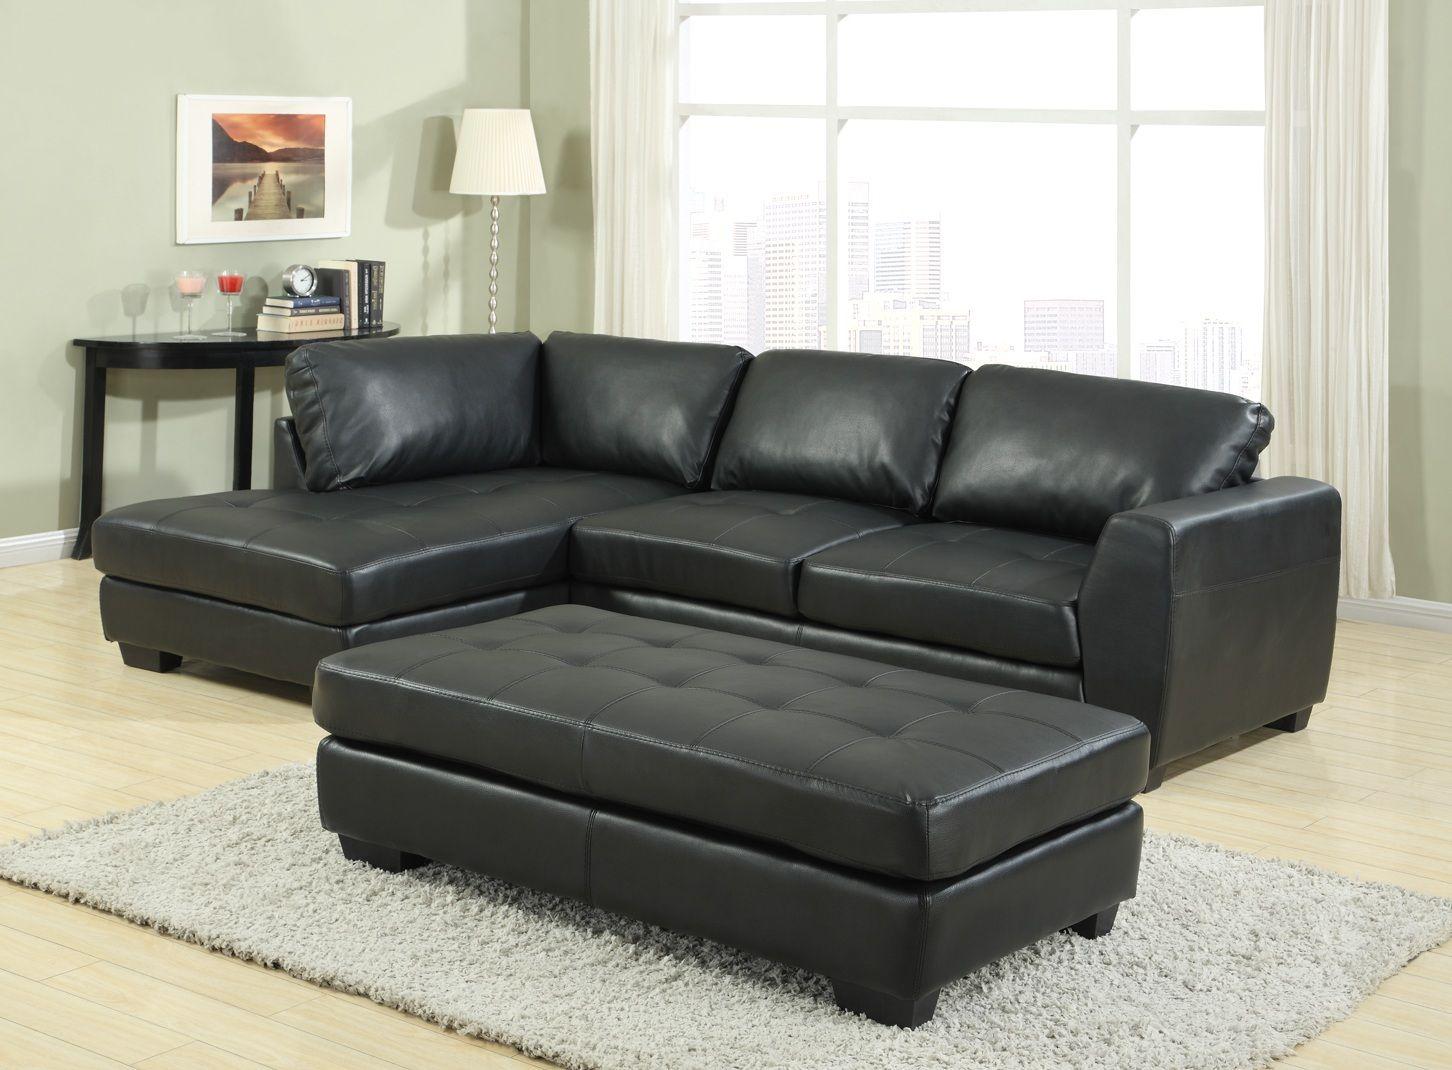 Miraculous Lunar Black Leather Corner Sofa Bed Sofa Foot Stool Cjindustries Chair Design For Home Cjindustriesco